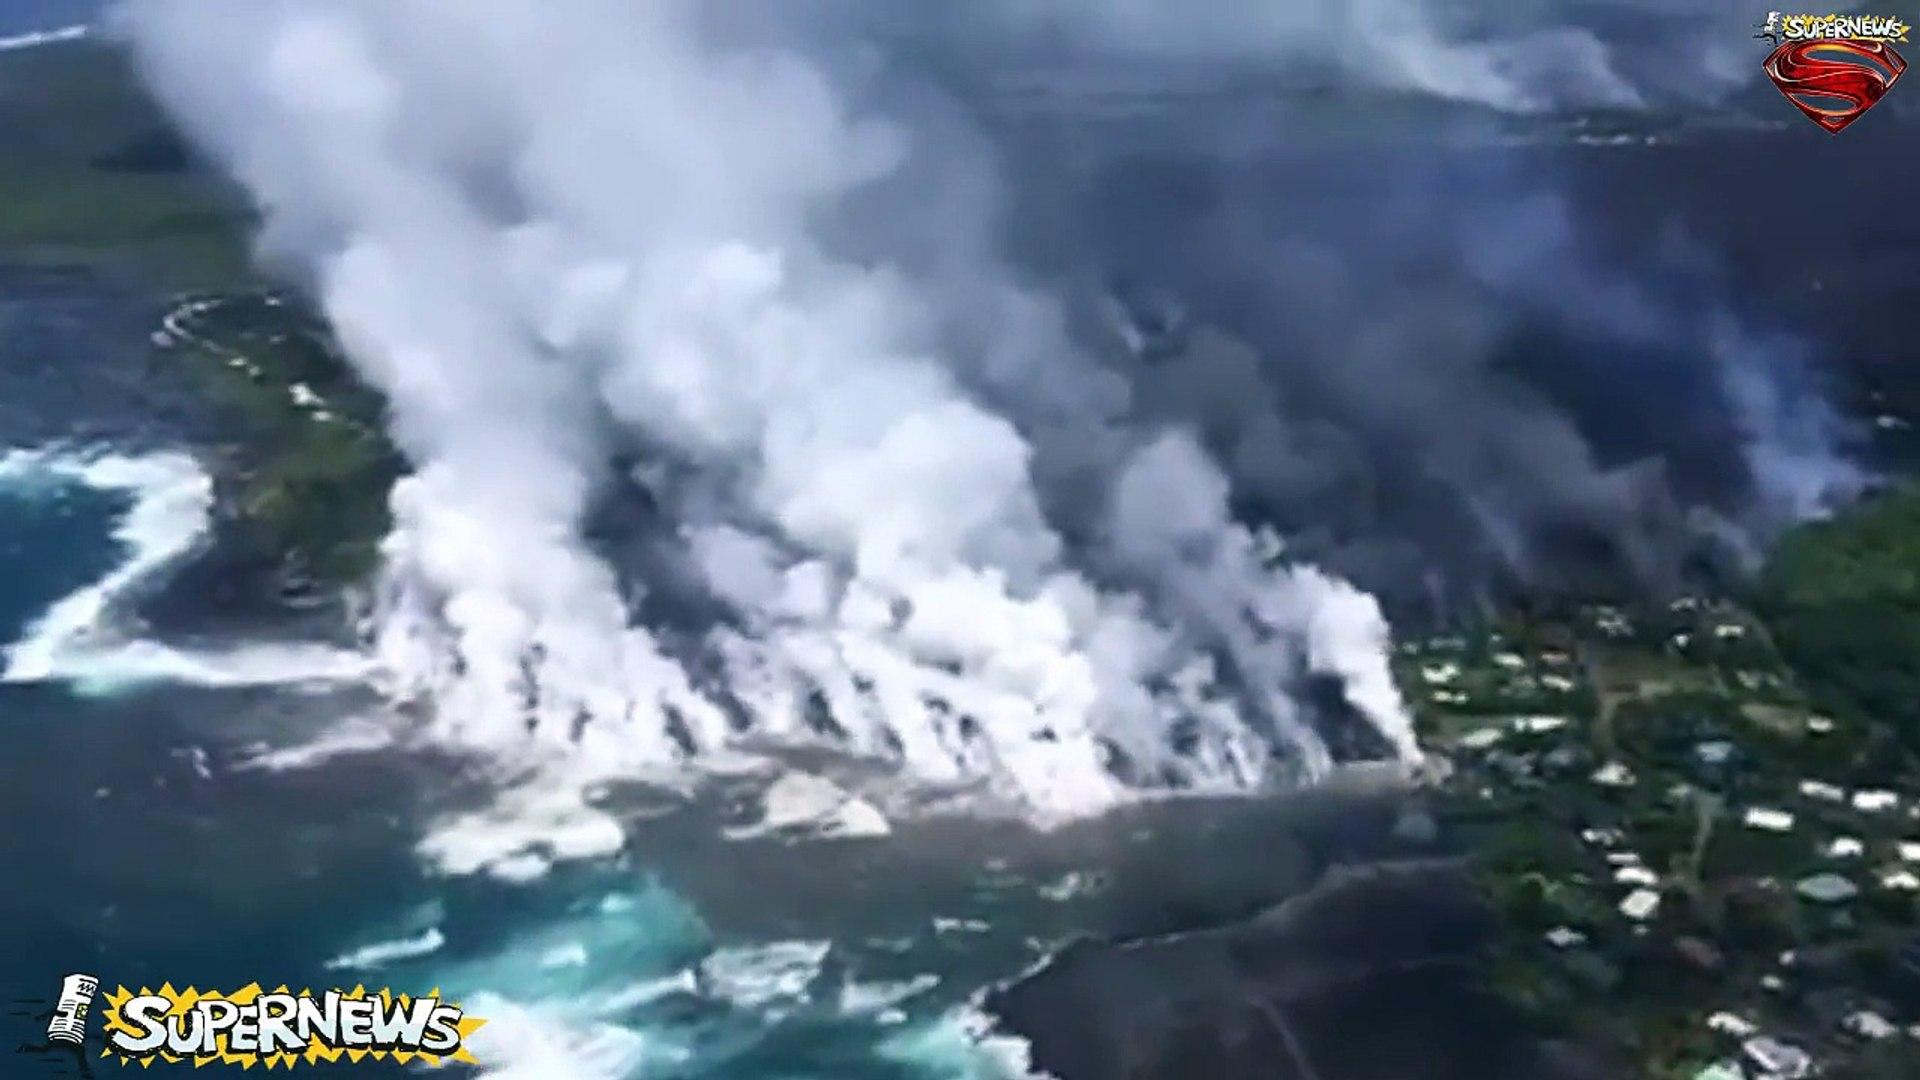 Hawaii volcano in numbers Kilauea buries TWO towns - 9,900 earthquakes hit Big Island